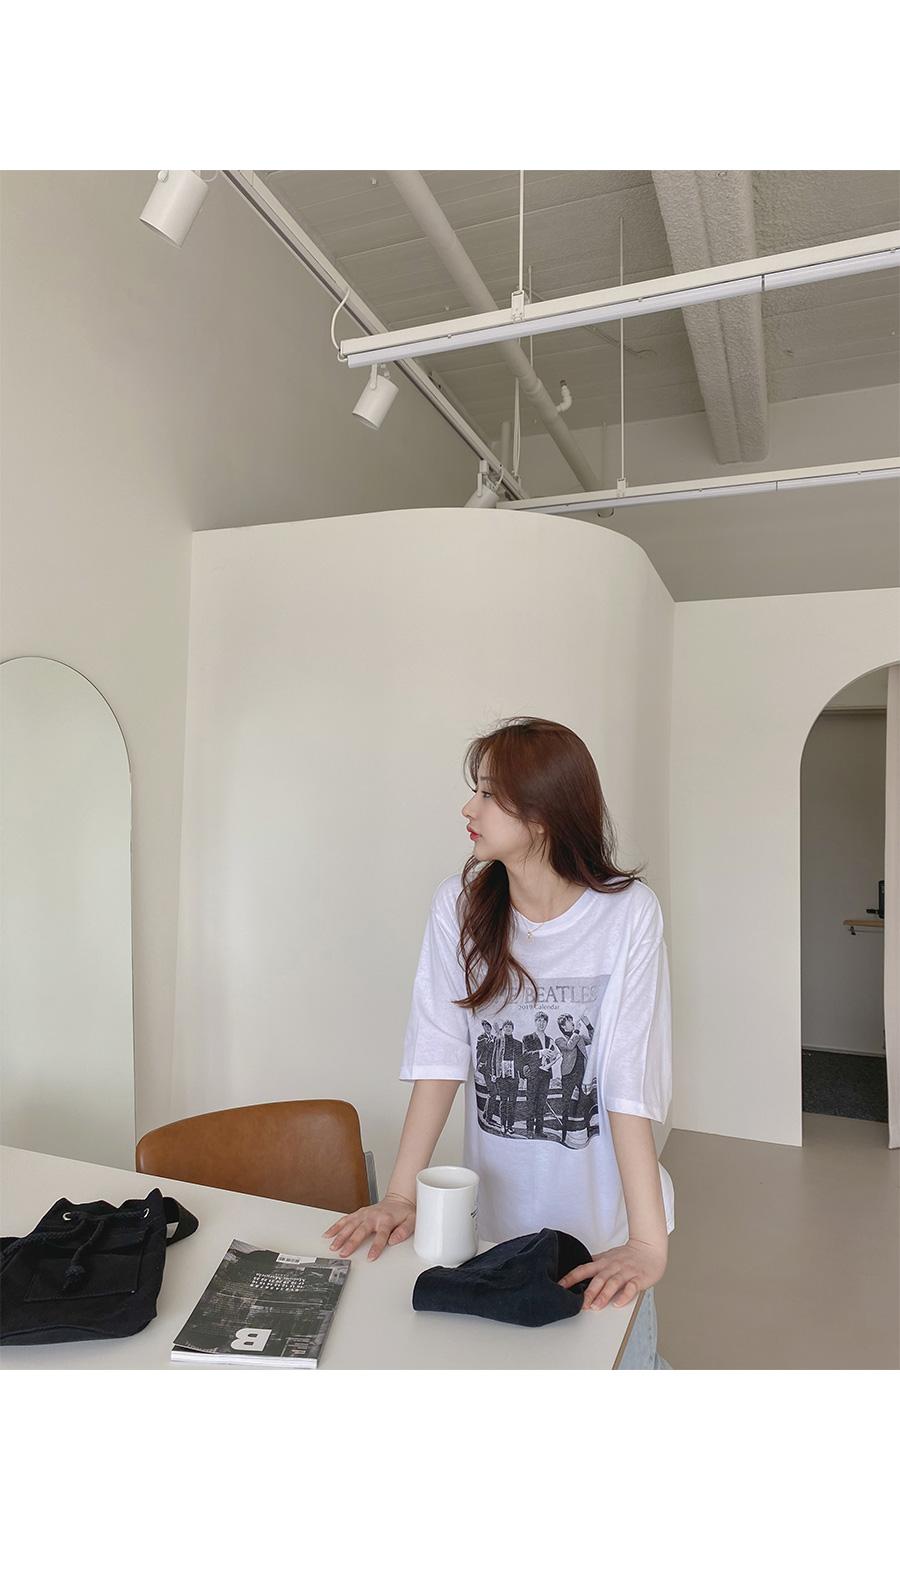 Big Size 55-99 The Light Overfit T-shirt